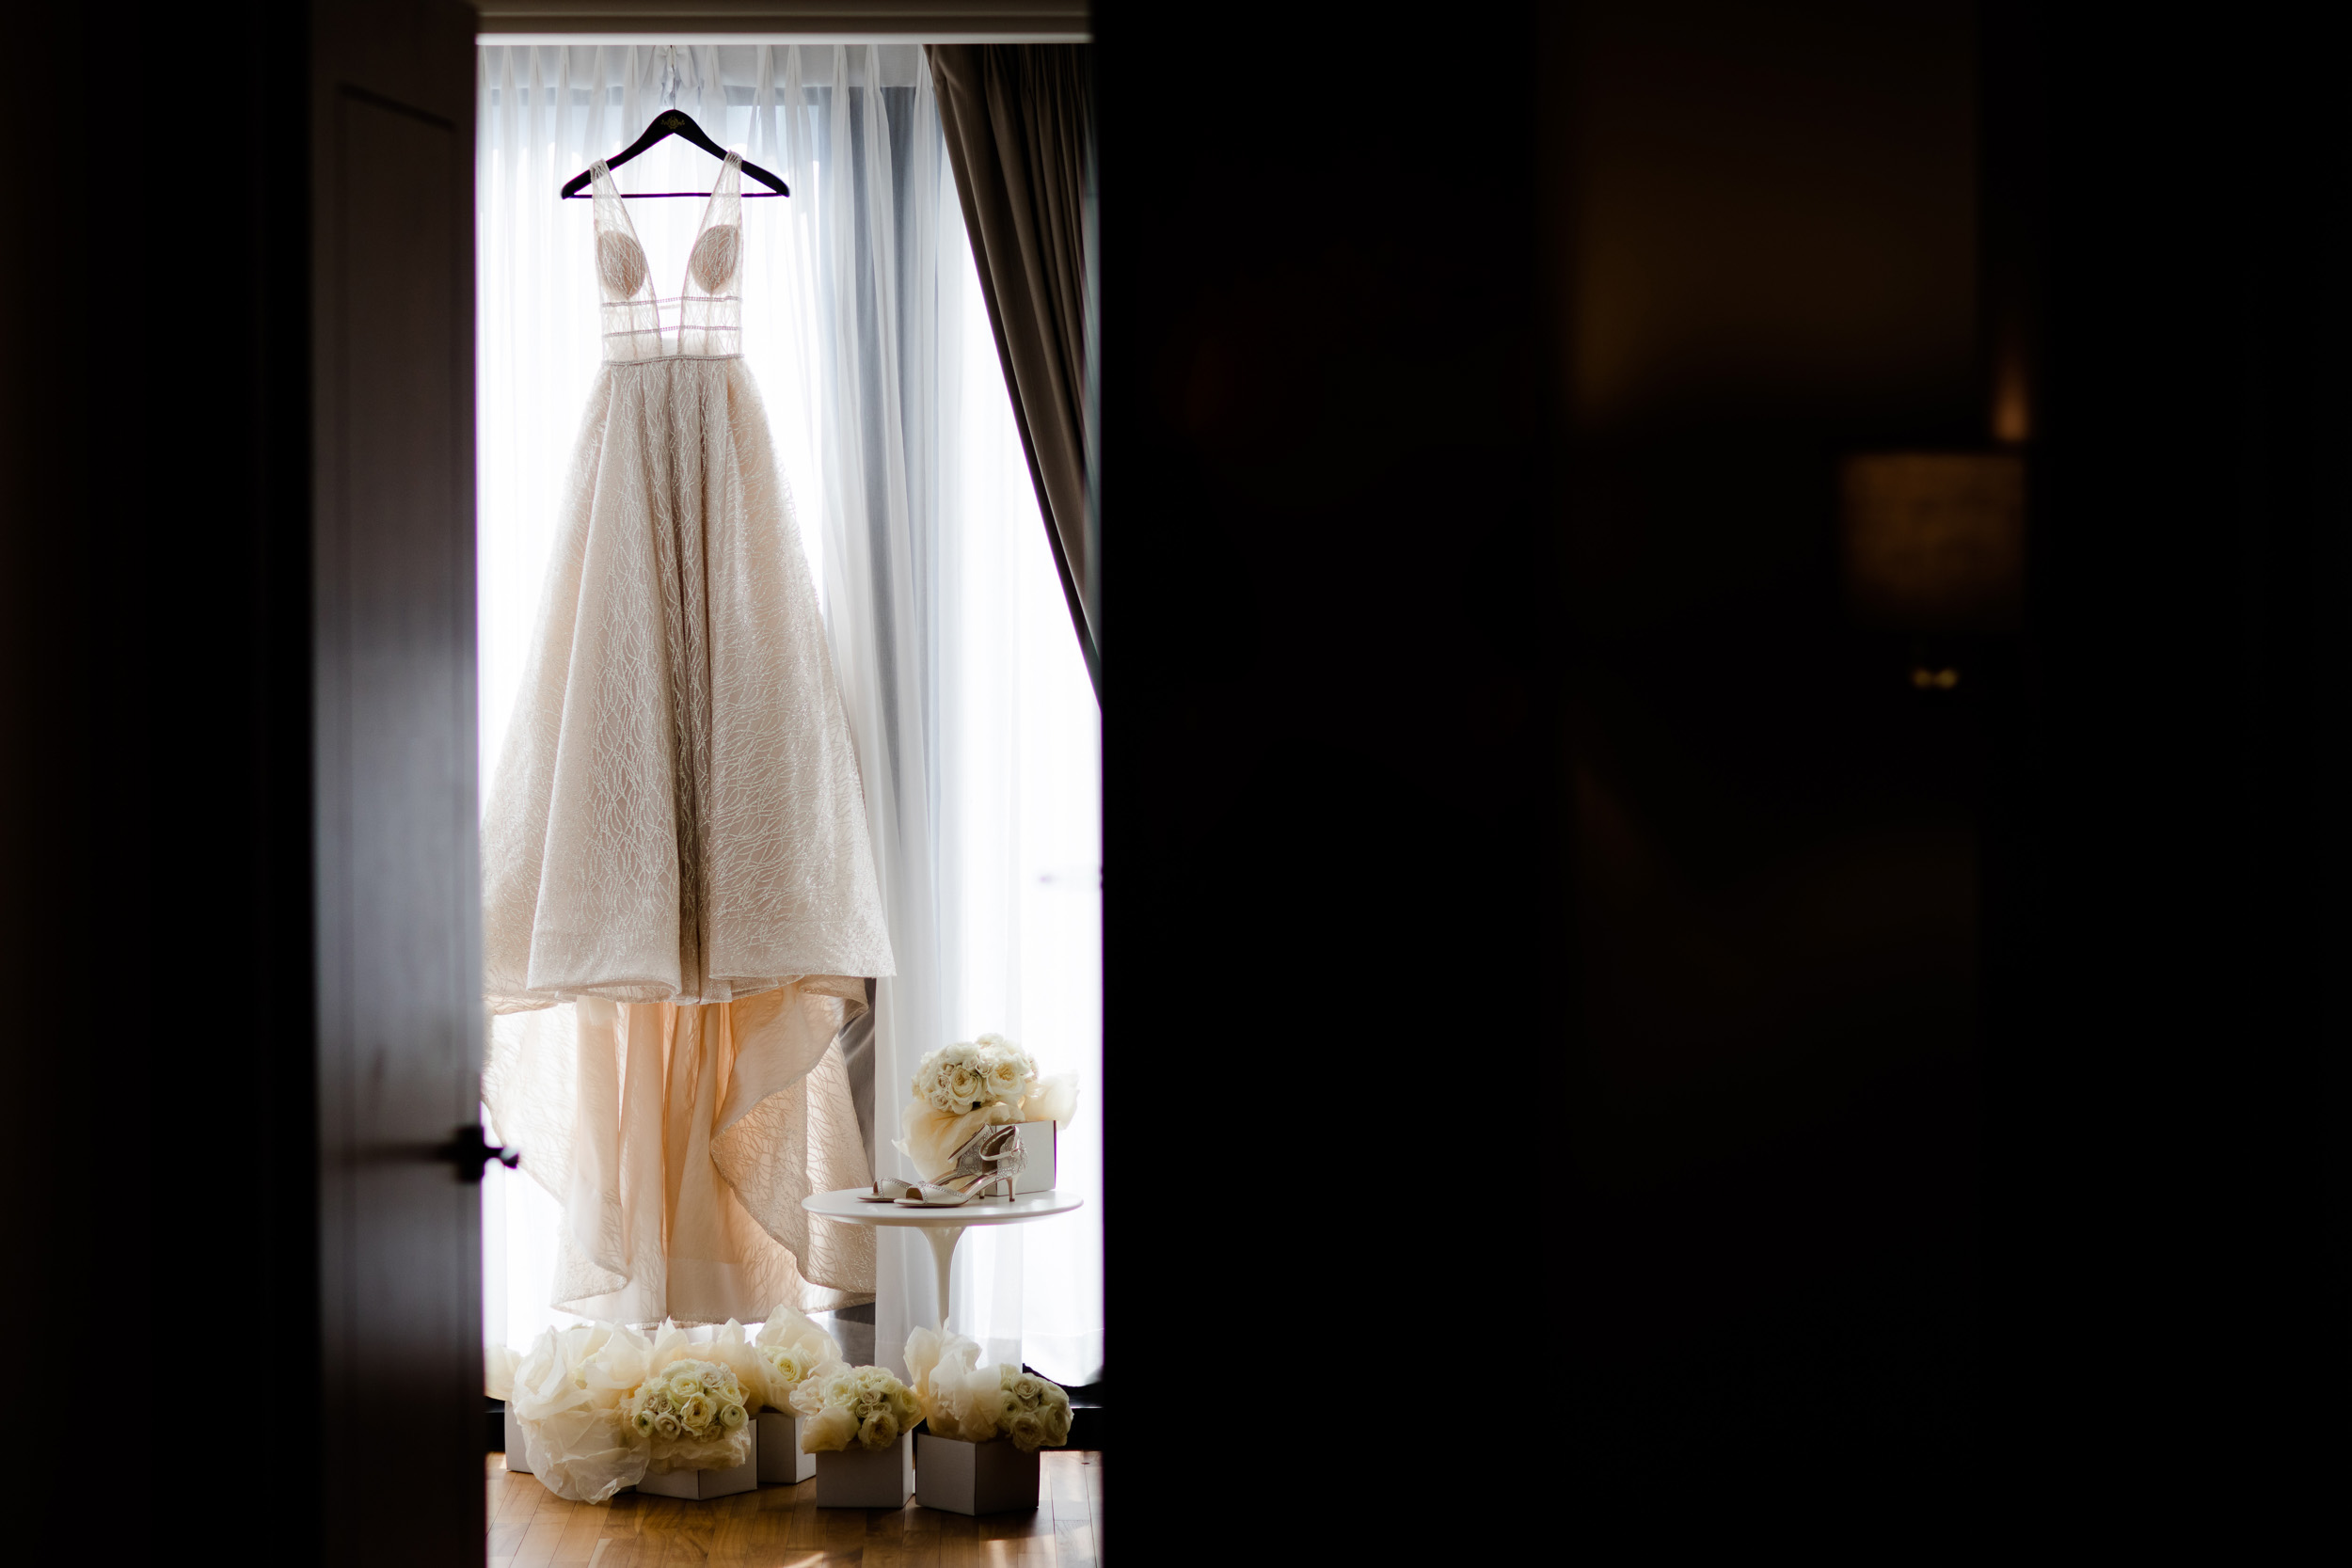 chicago-illuminating-co-wedding-photos-9.jpg